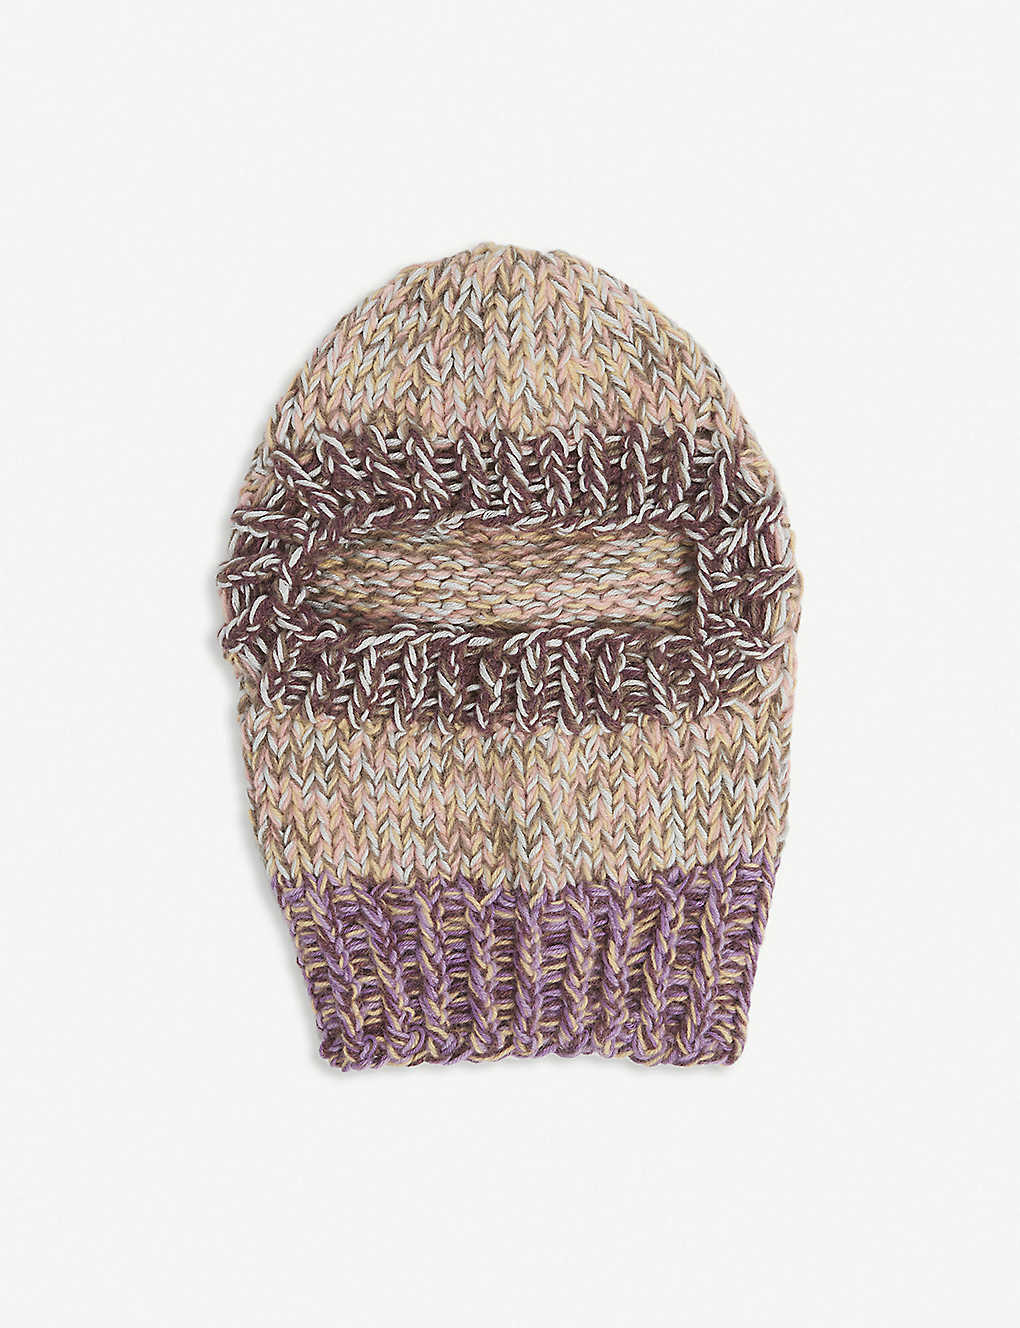 NITH Upcycled Uma knitted balaclava